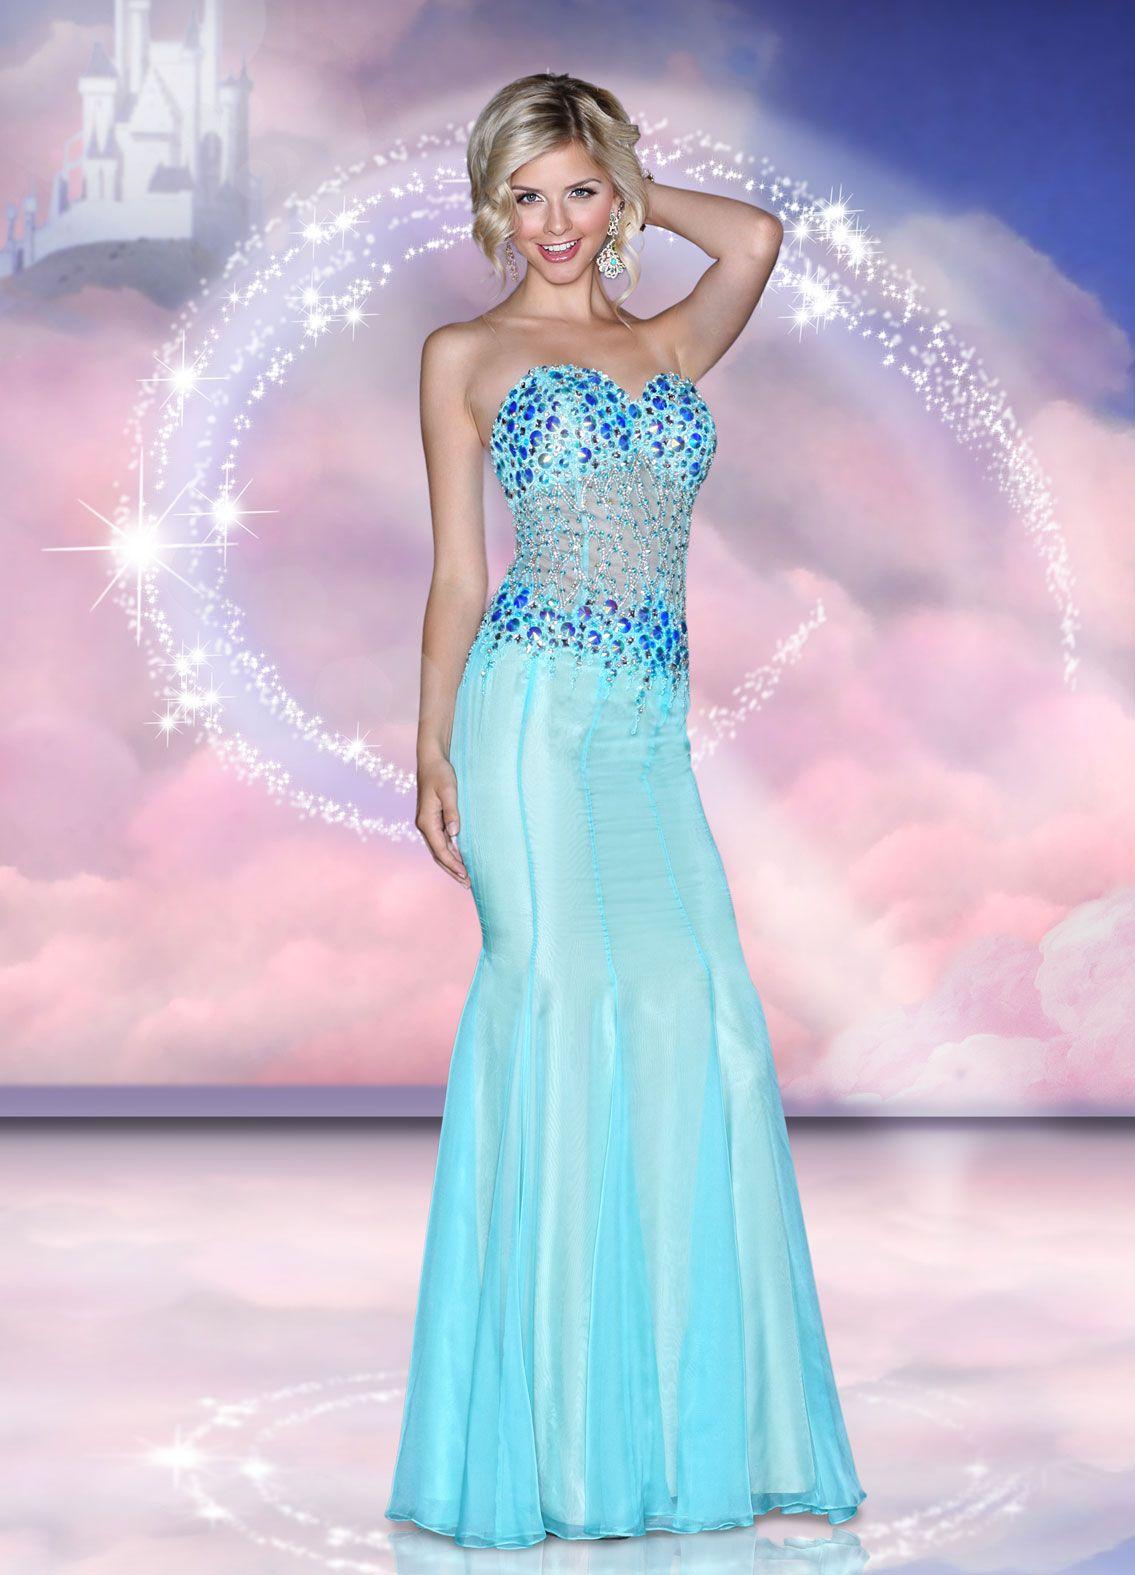 Disney forever enchanted prom dresses adorable pinterest